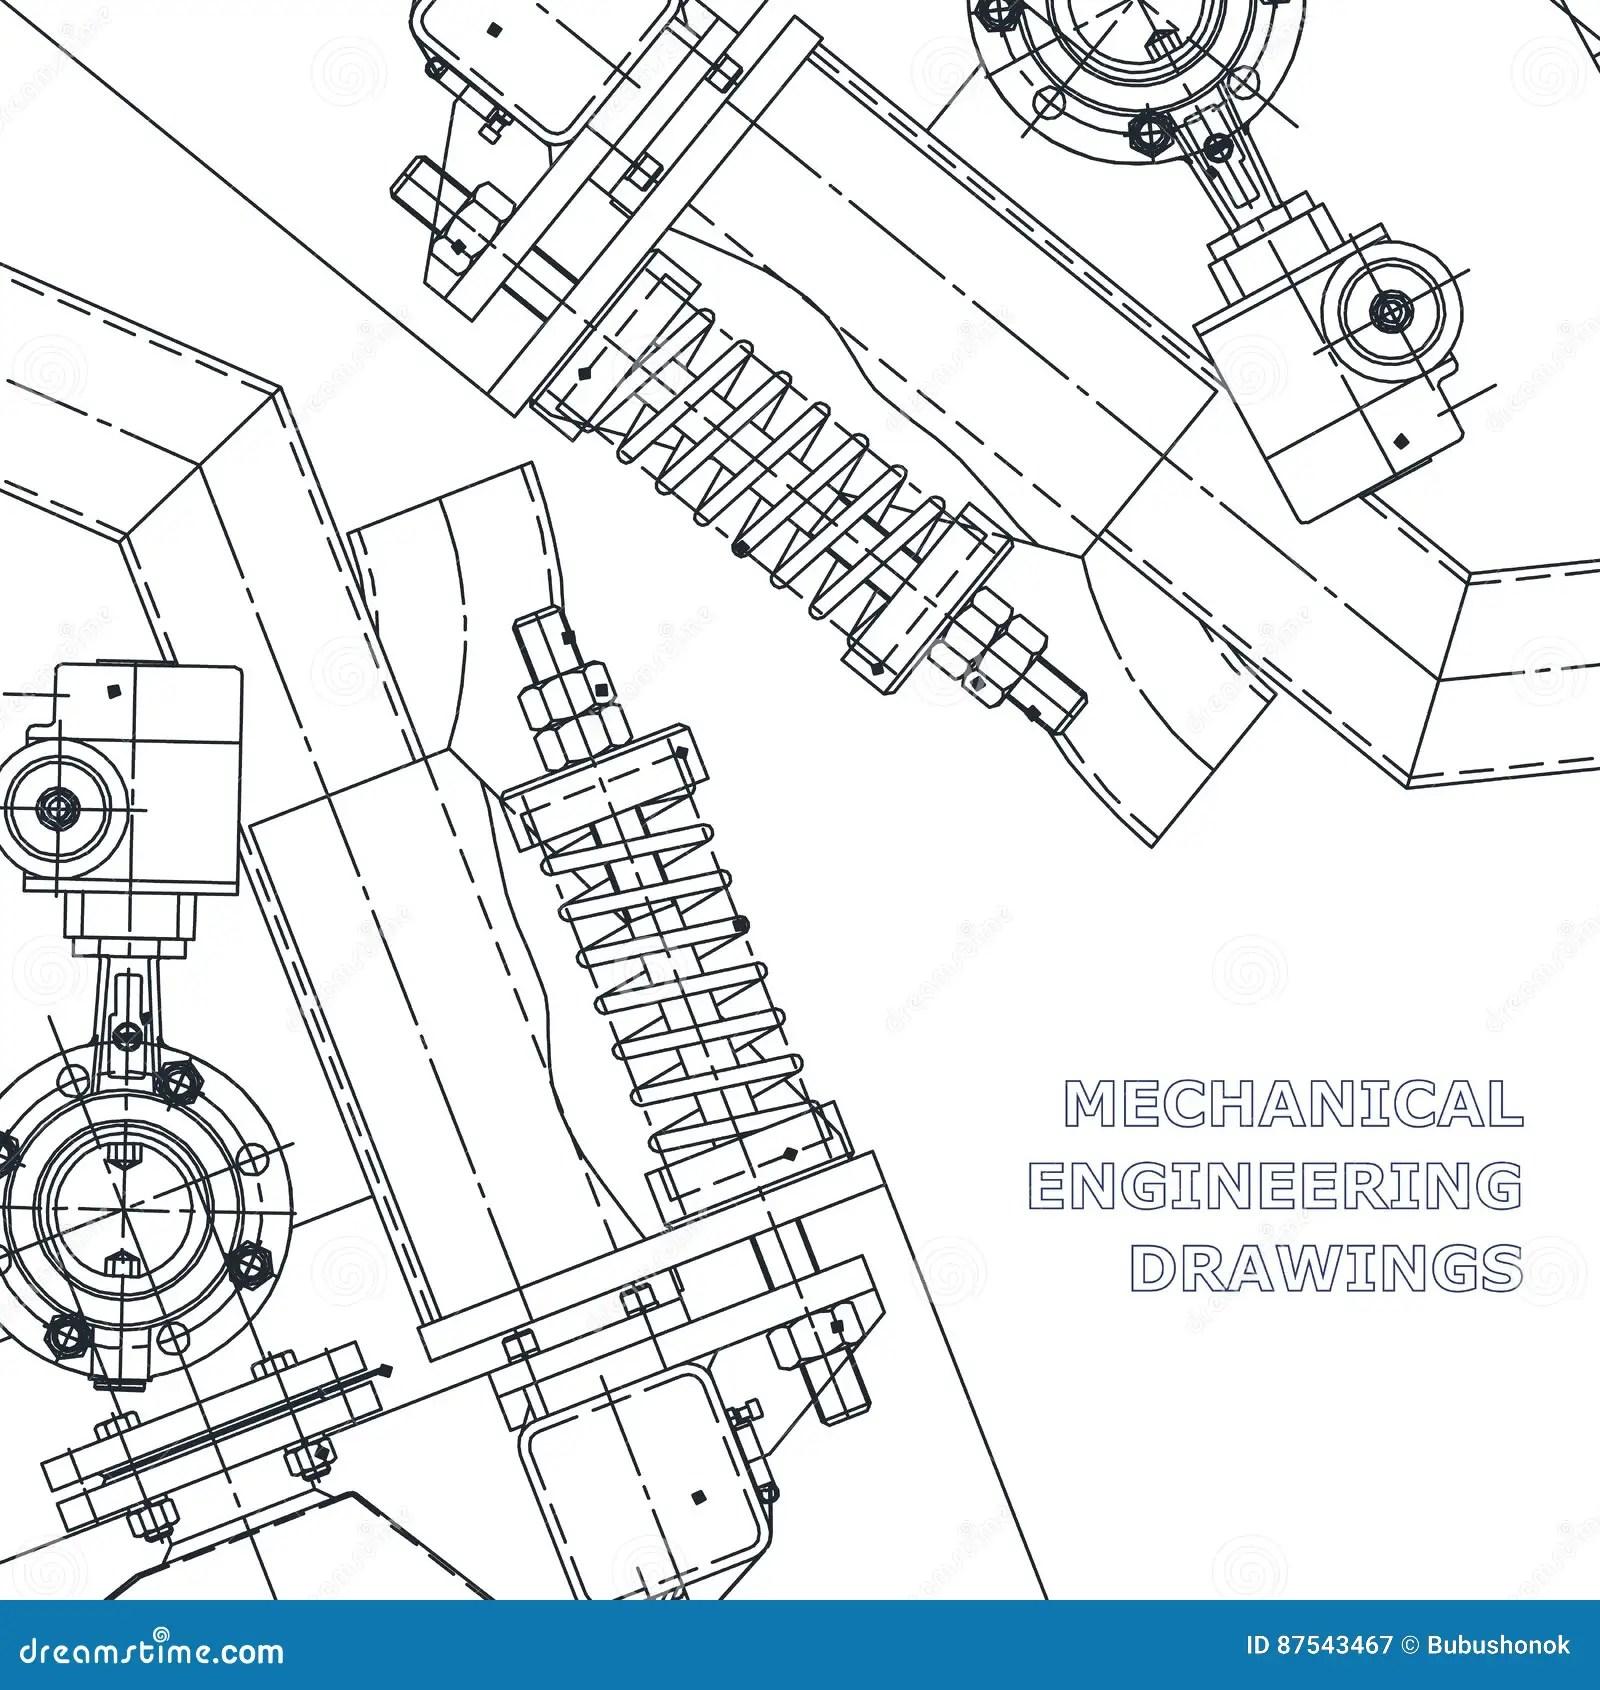 Mechanical Engineering Drawings Stock Vector